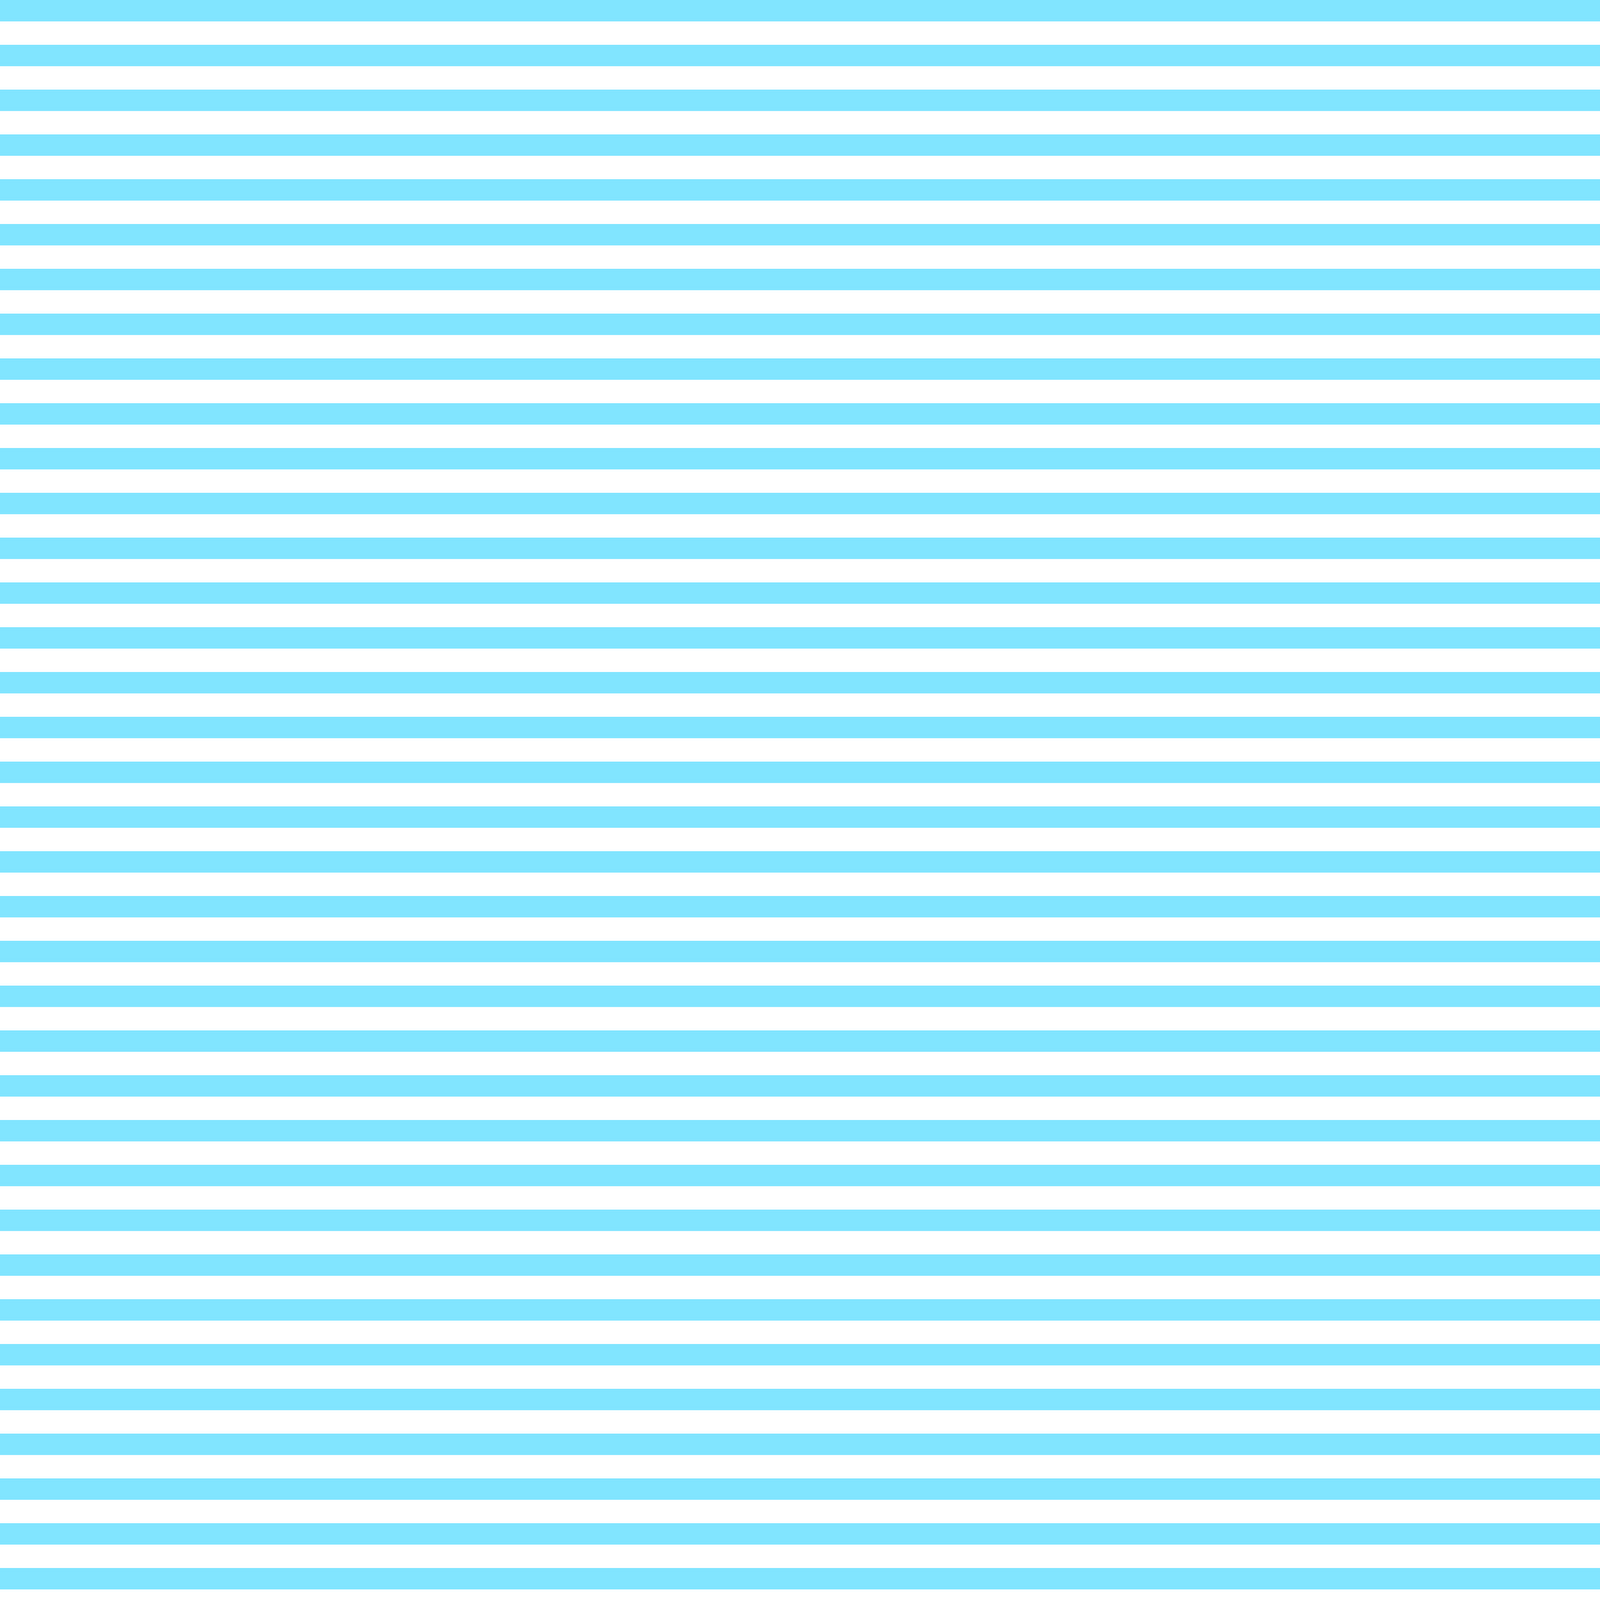 Free Digital And Printable Striped Scrapbooking Paper Timeless Sailor Look Nautical Themed Paper Klassisch Gestreiftes Papier Freebies